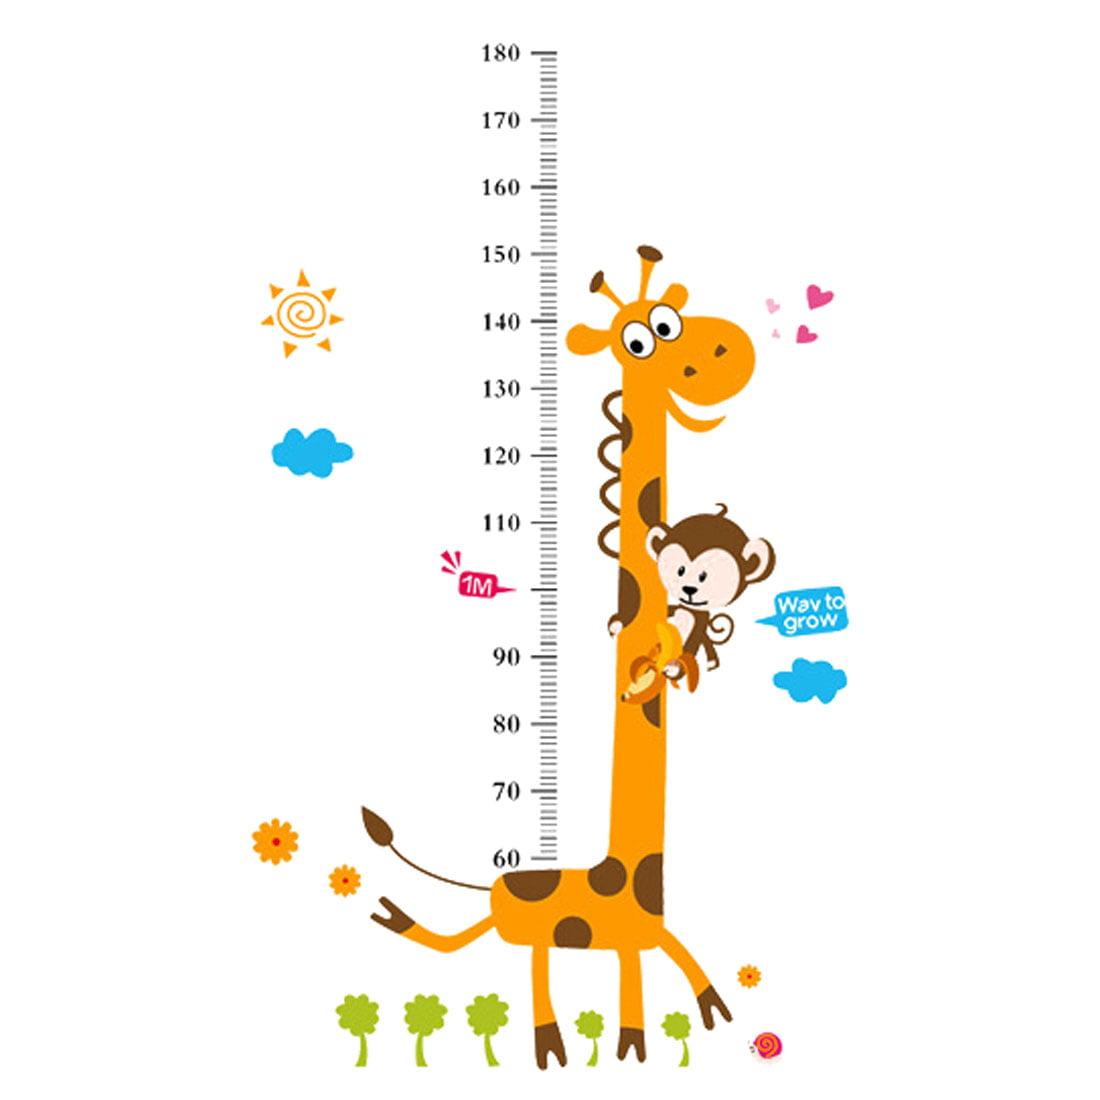 Bedroom Decor Cartoon Style Monkey Giraffe Pattern Removable Wall Decor Sticker Decal